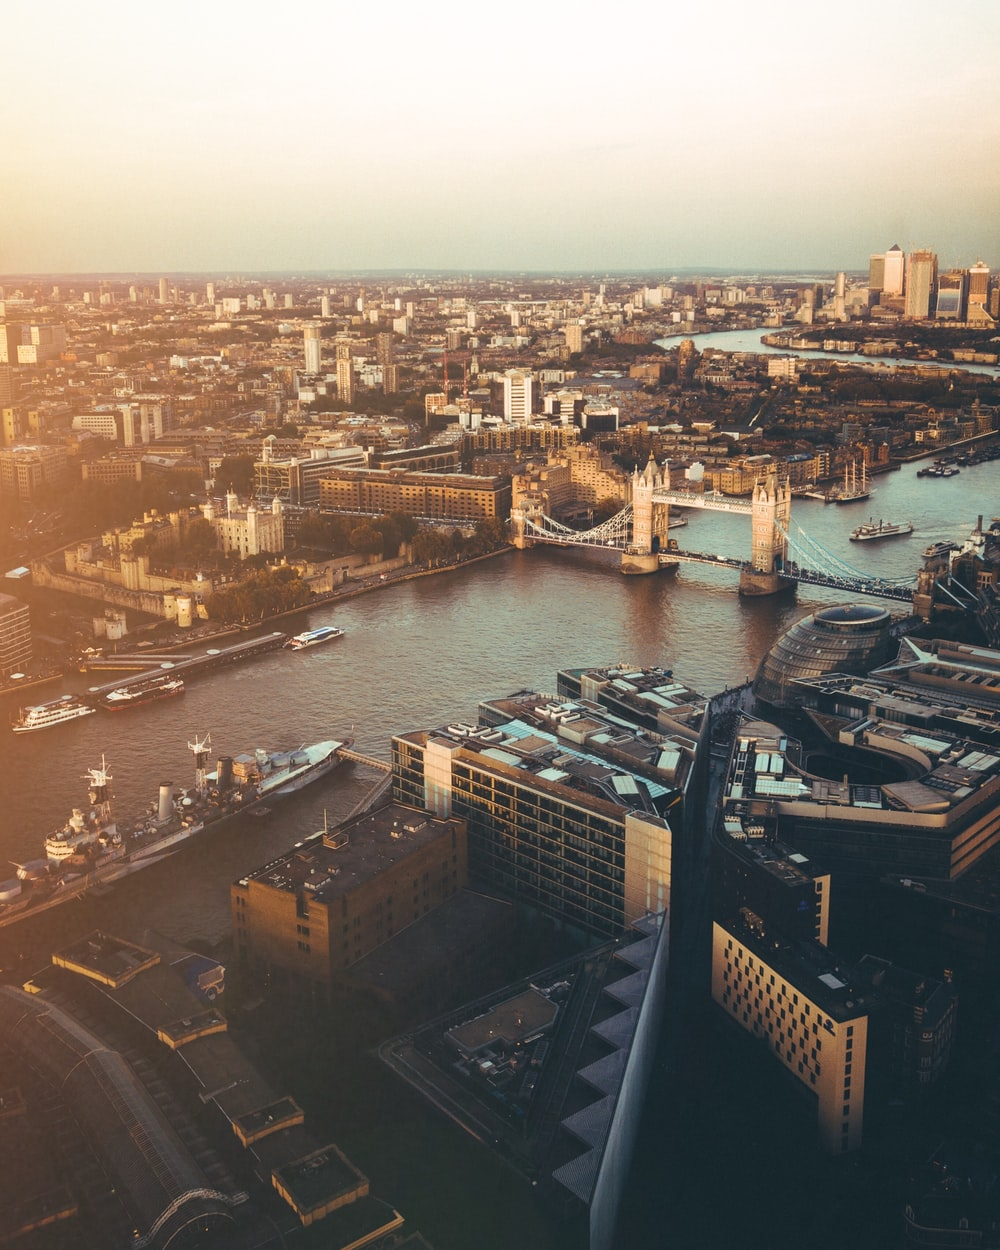 bird's eye view photo of Tower Bridge, London